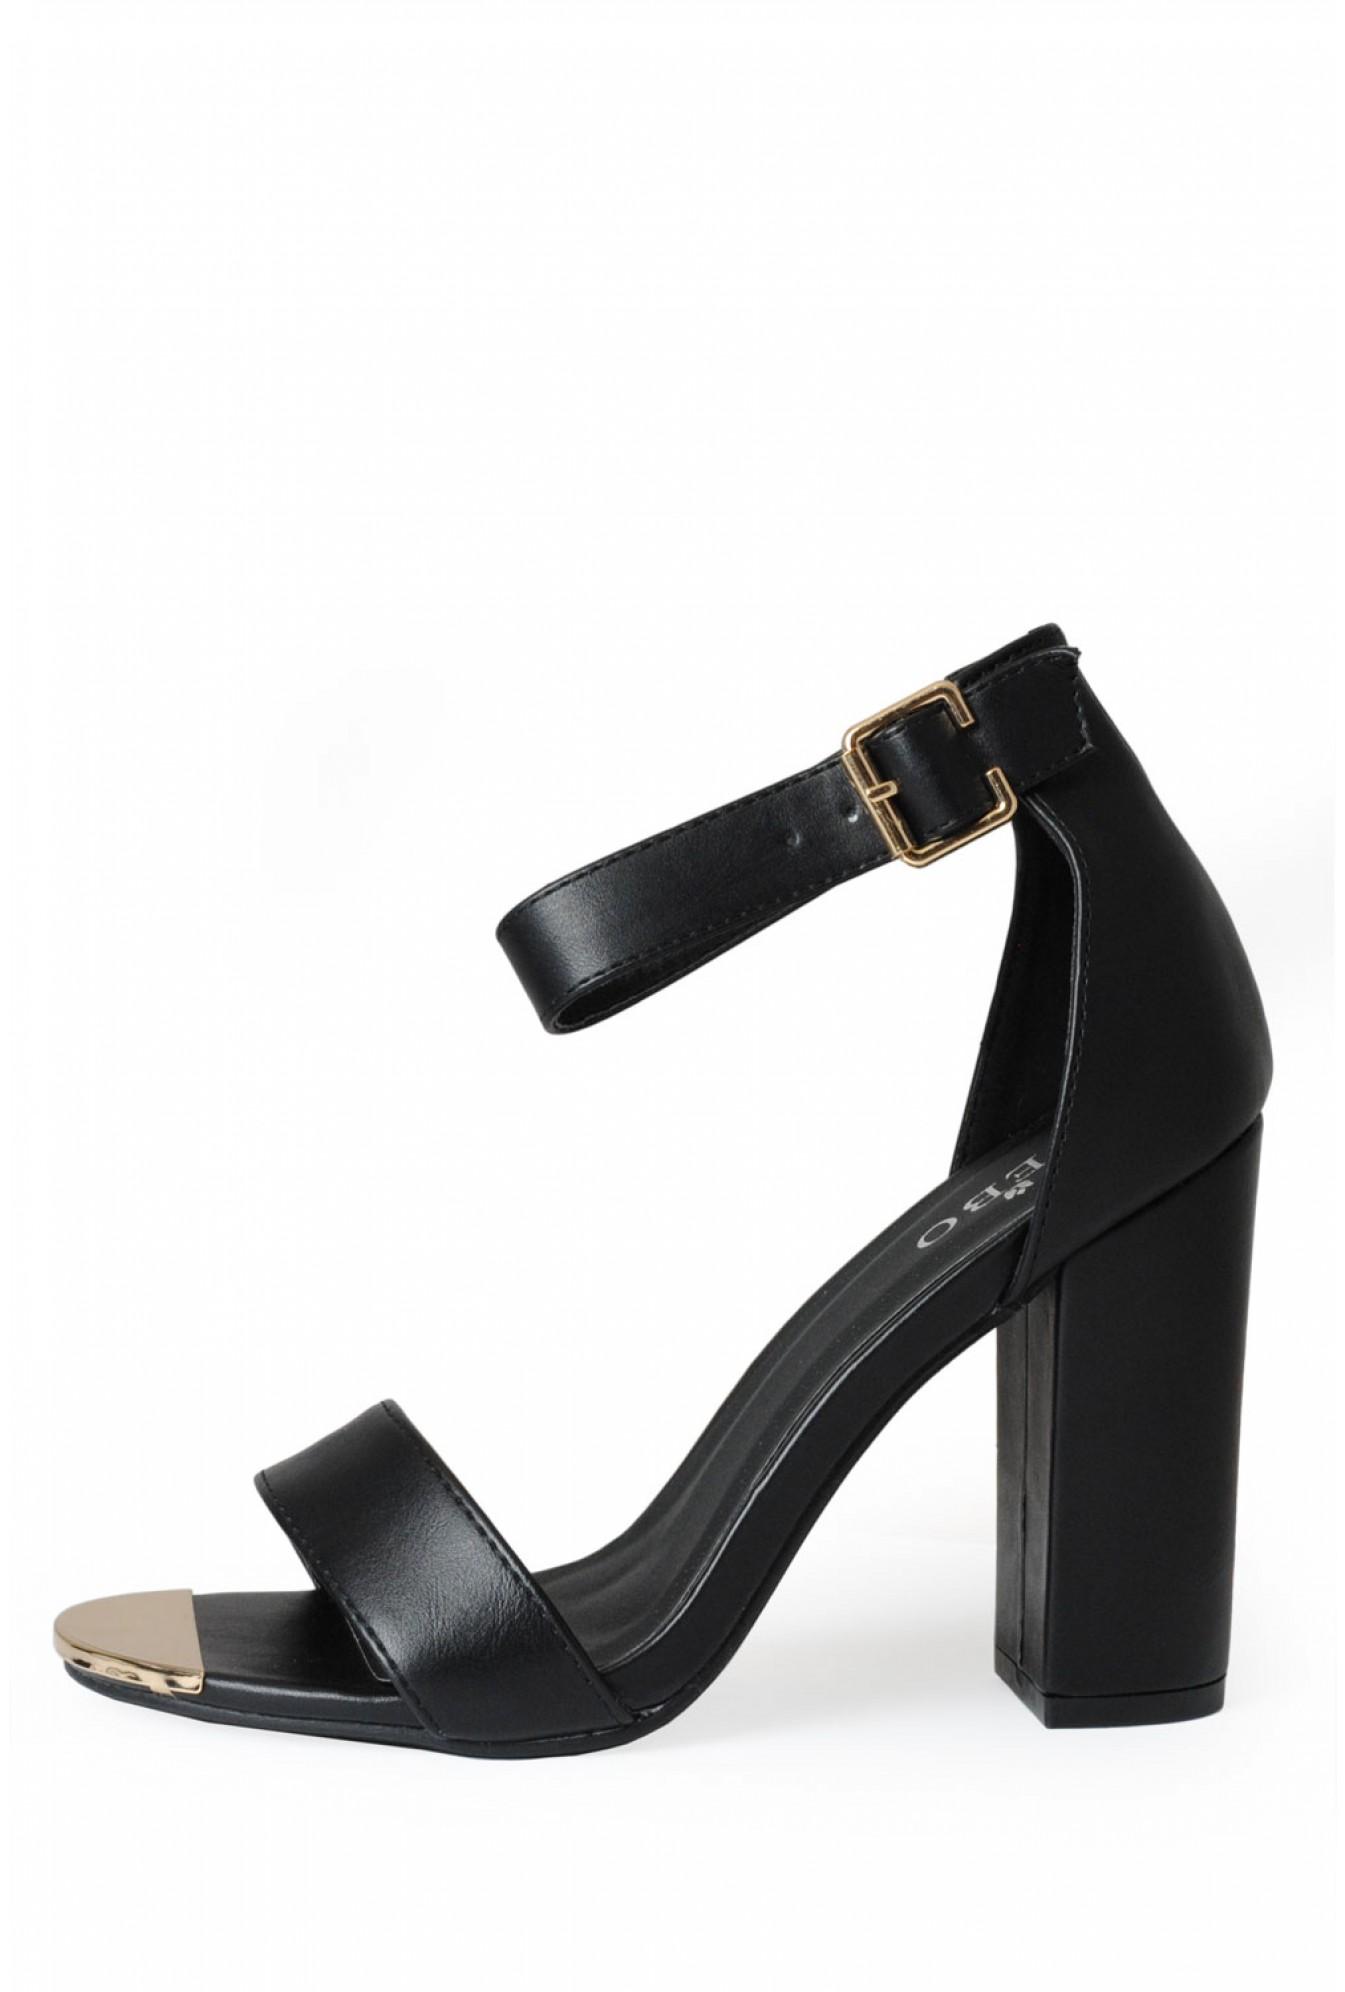 f4ebc8c423 Indigo Footwear Aliya Strappy Block Heel Sandals in Black | iCLOTHING